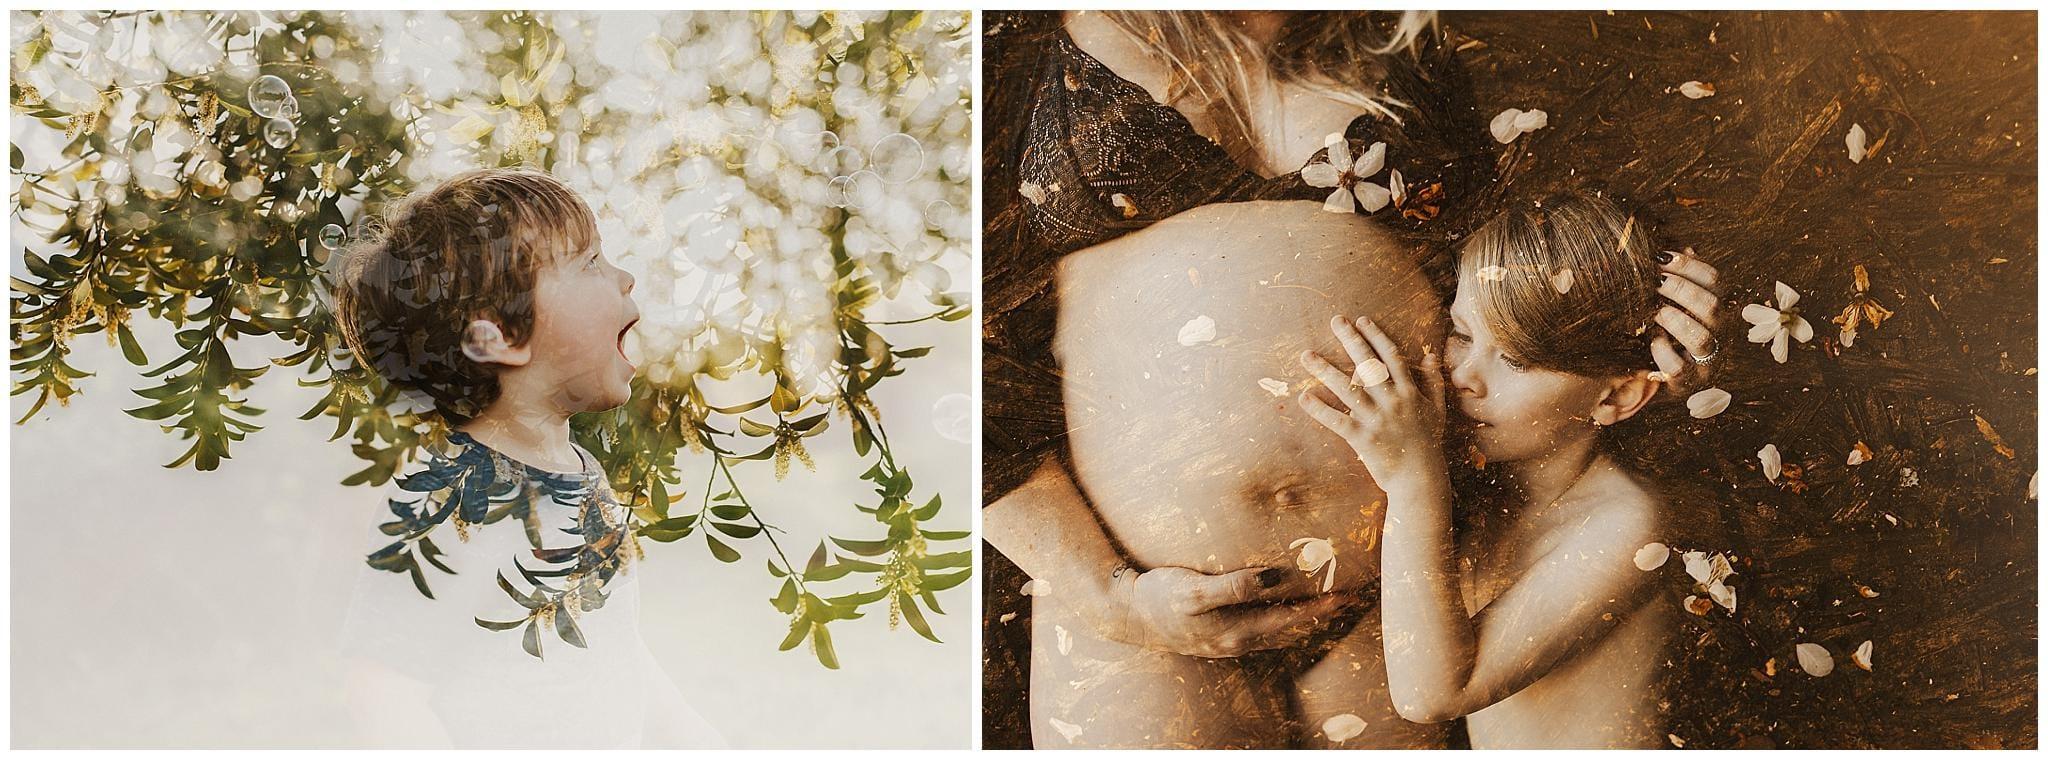 double exposures by portland photographer